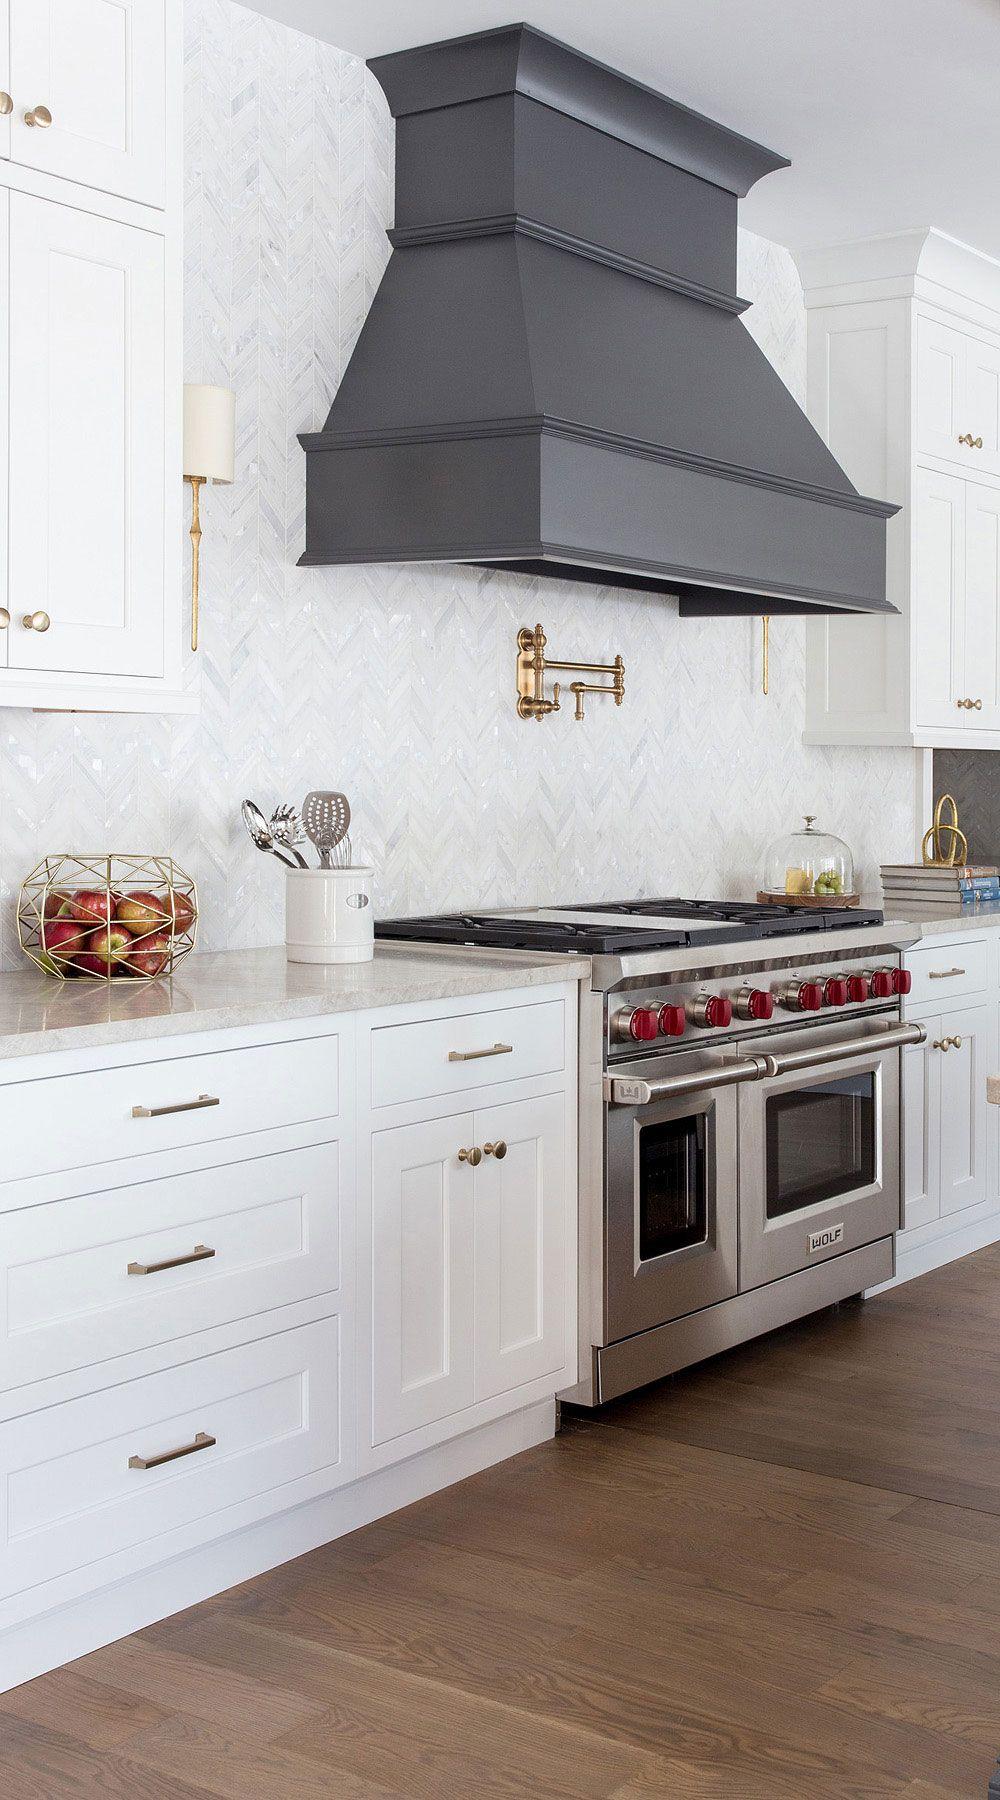 112 Chevron Backsplash Zig Zag Stunning Chevron Pattern Tiles In 2020 Shaker Style Kitchen Cabinets White Shaker Kitchen Shaker Style Kitchens